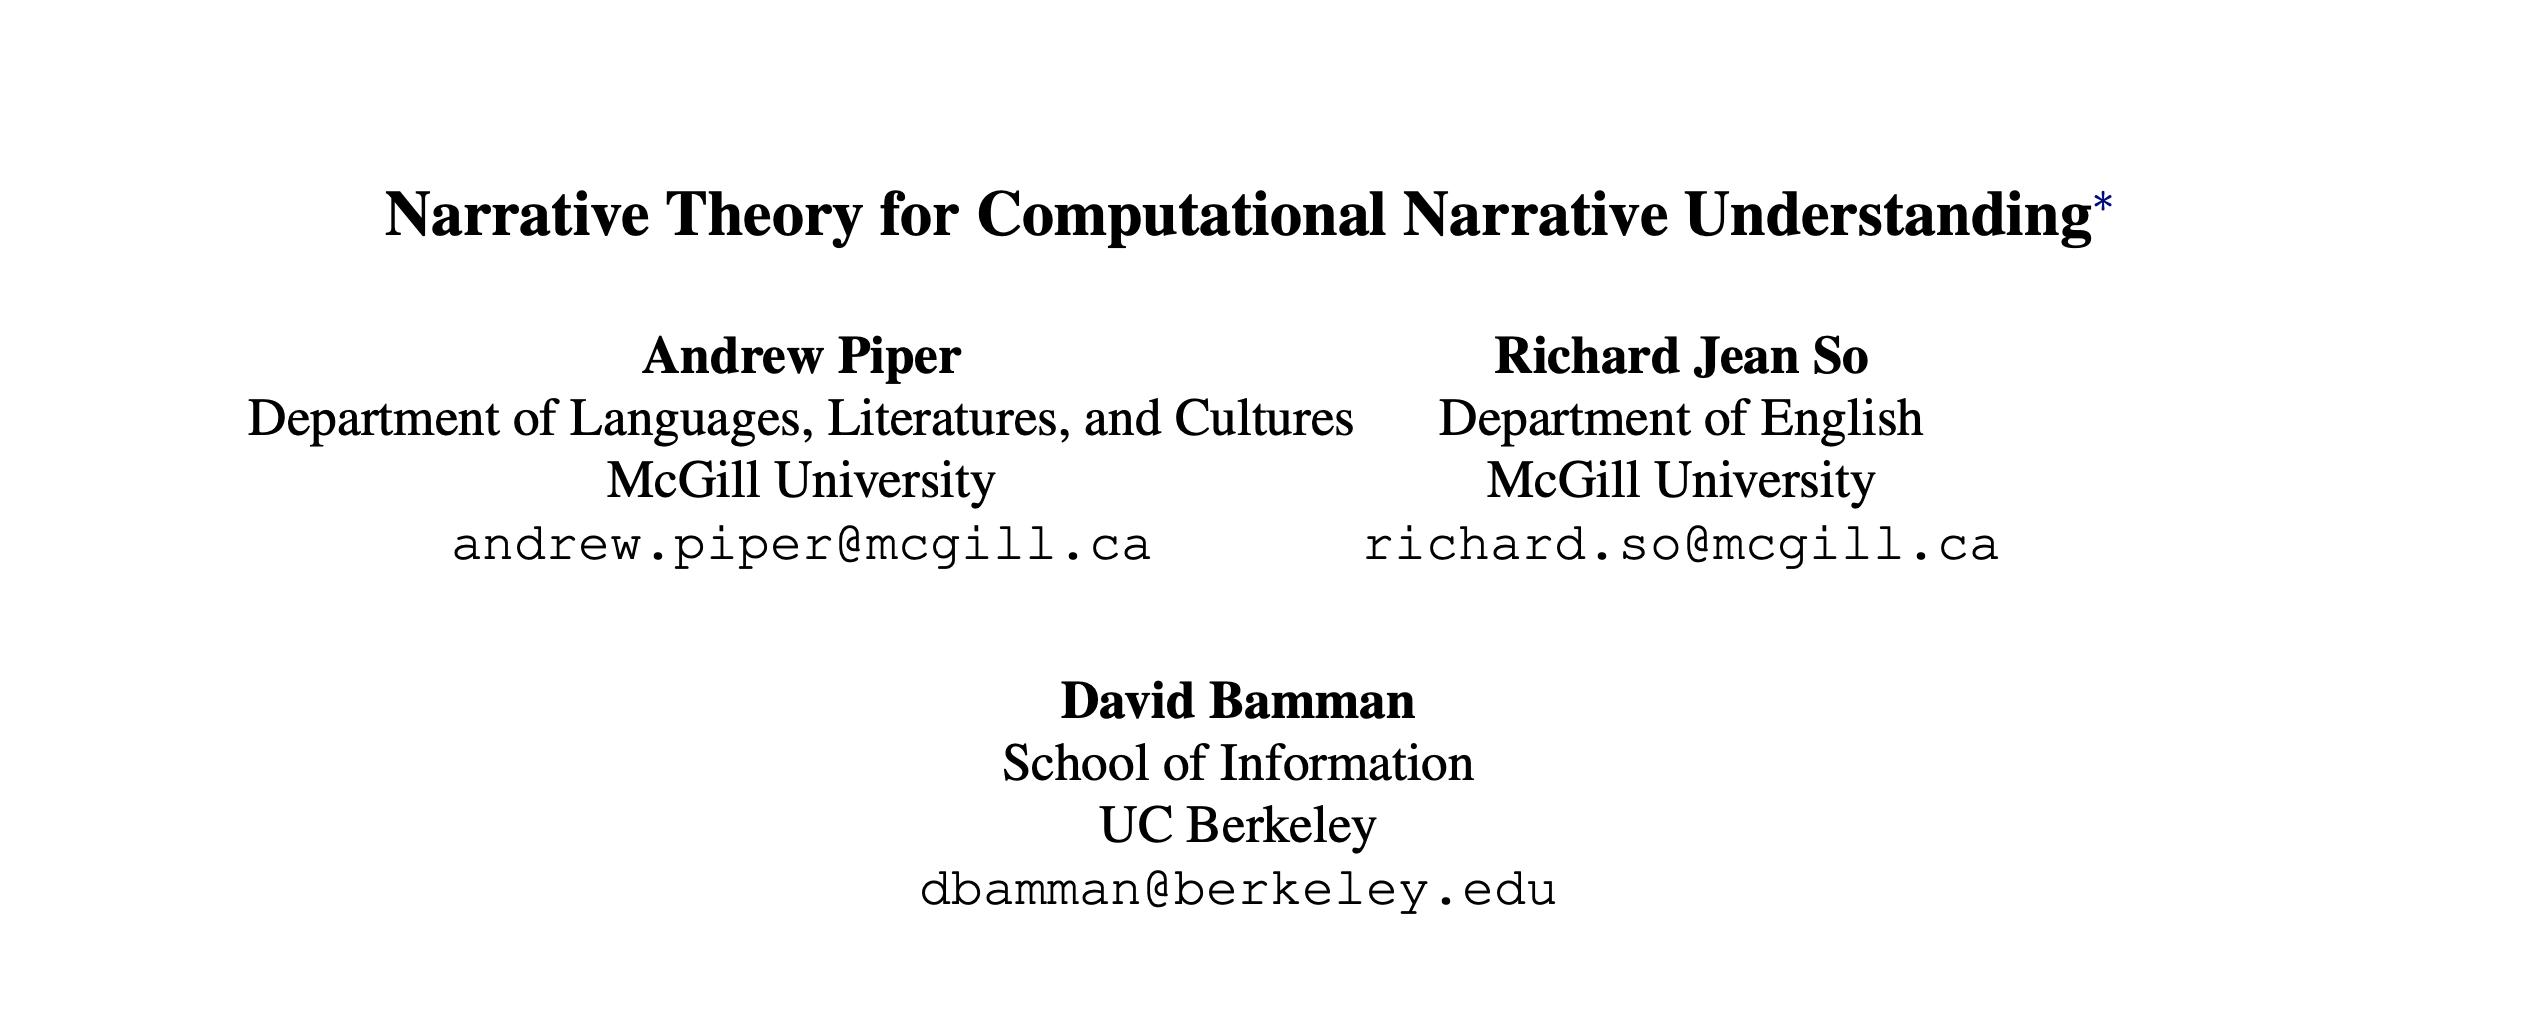 Narrative Theory for Computational Narrative Understanding